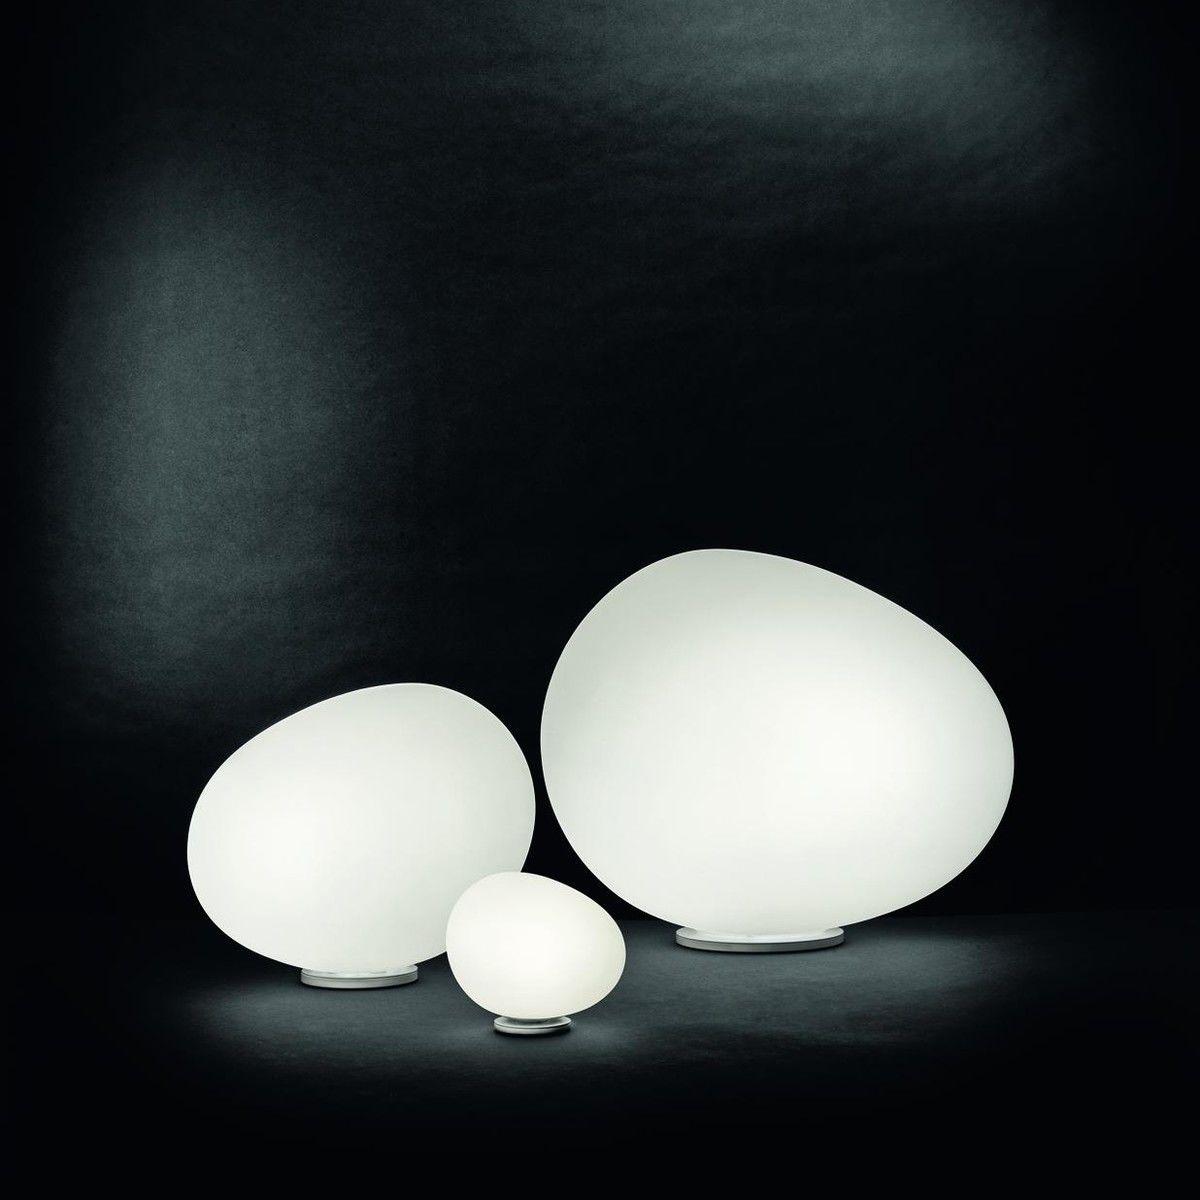 gregg table lamp floor lamp foscarini. Black Bedroom Furniture Sets. Home Design Ideas